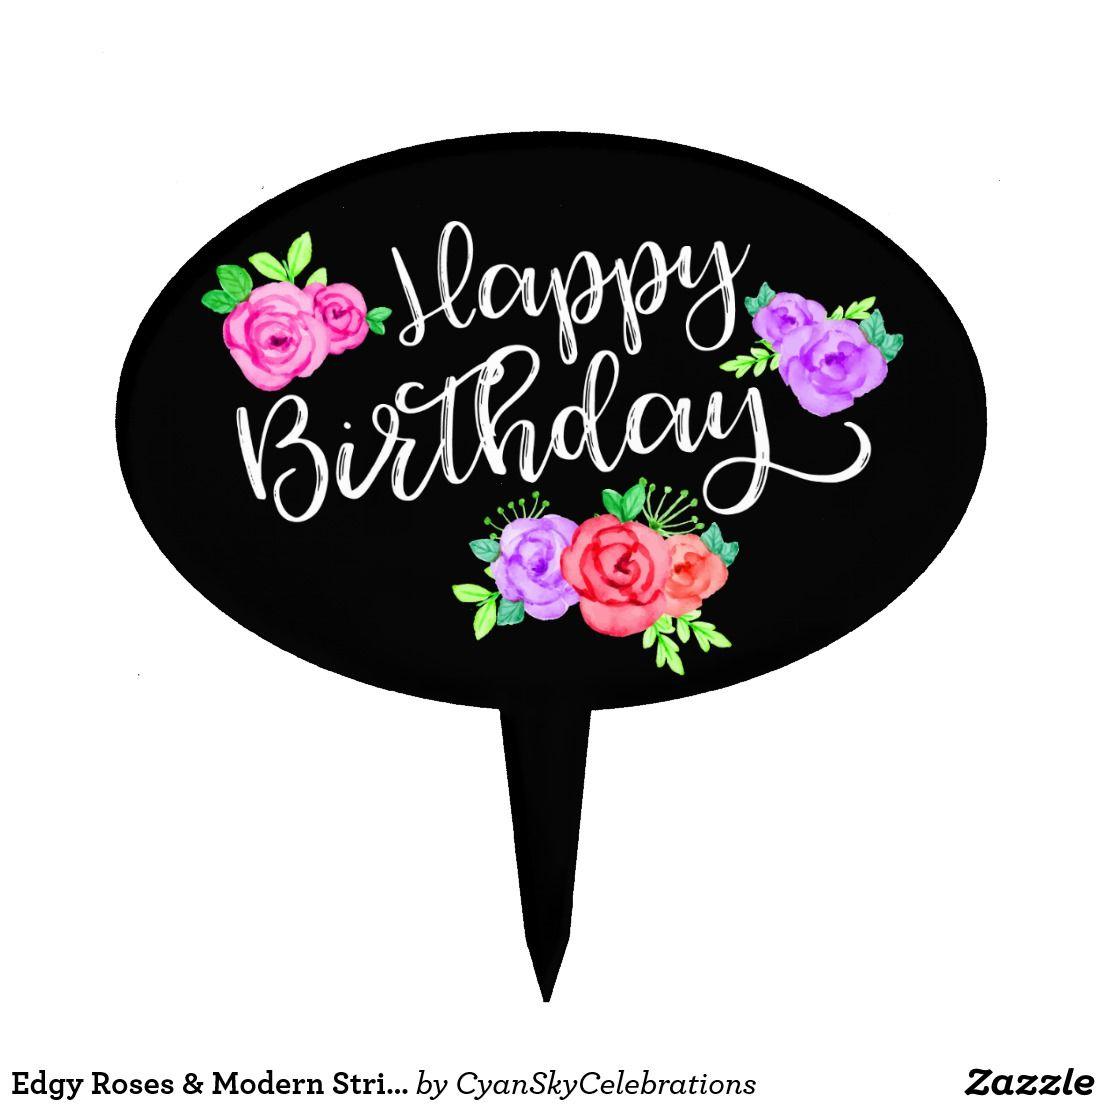 Edgy Roses & Modern Stripes Trendy Happy Birthday Cake Topper | Zazzle.com in 2021 | Birthday ...